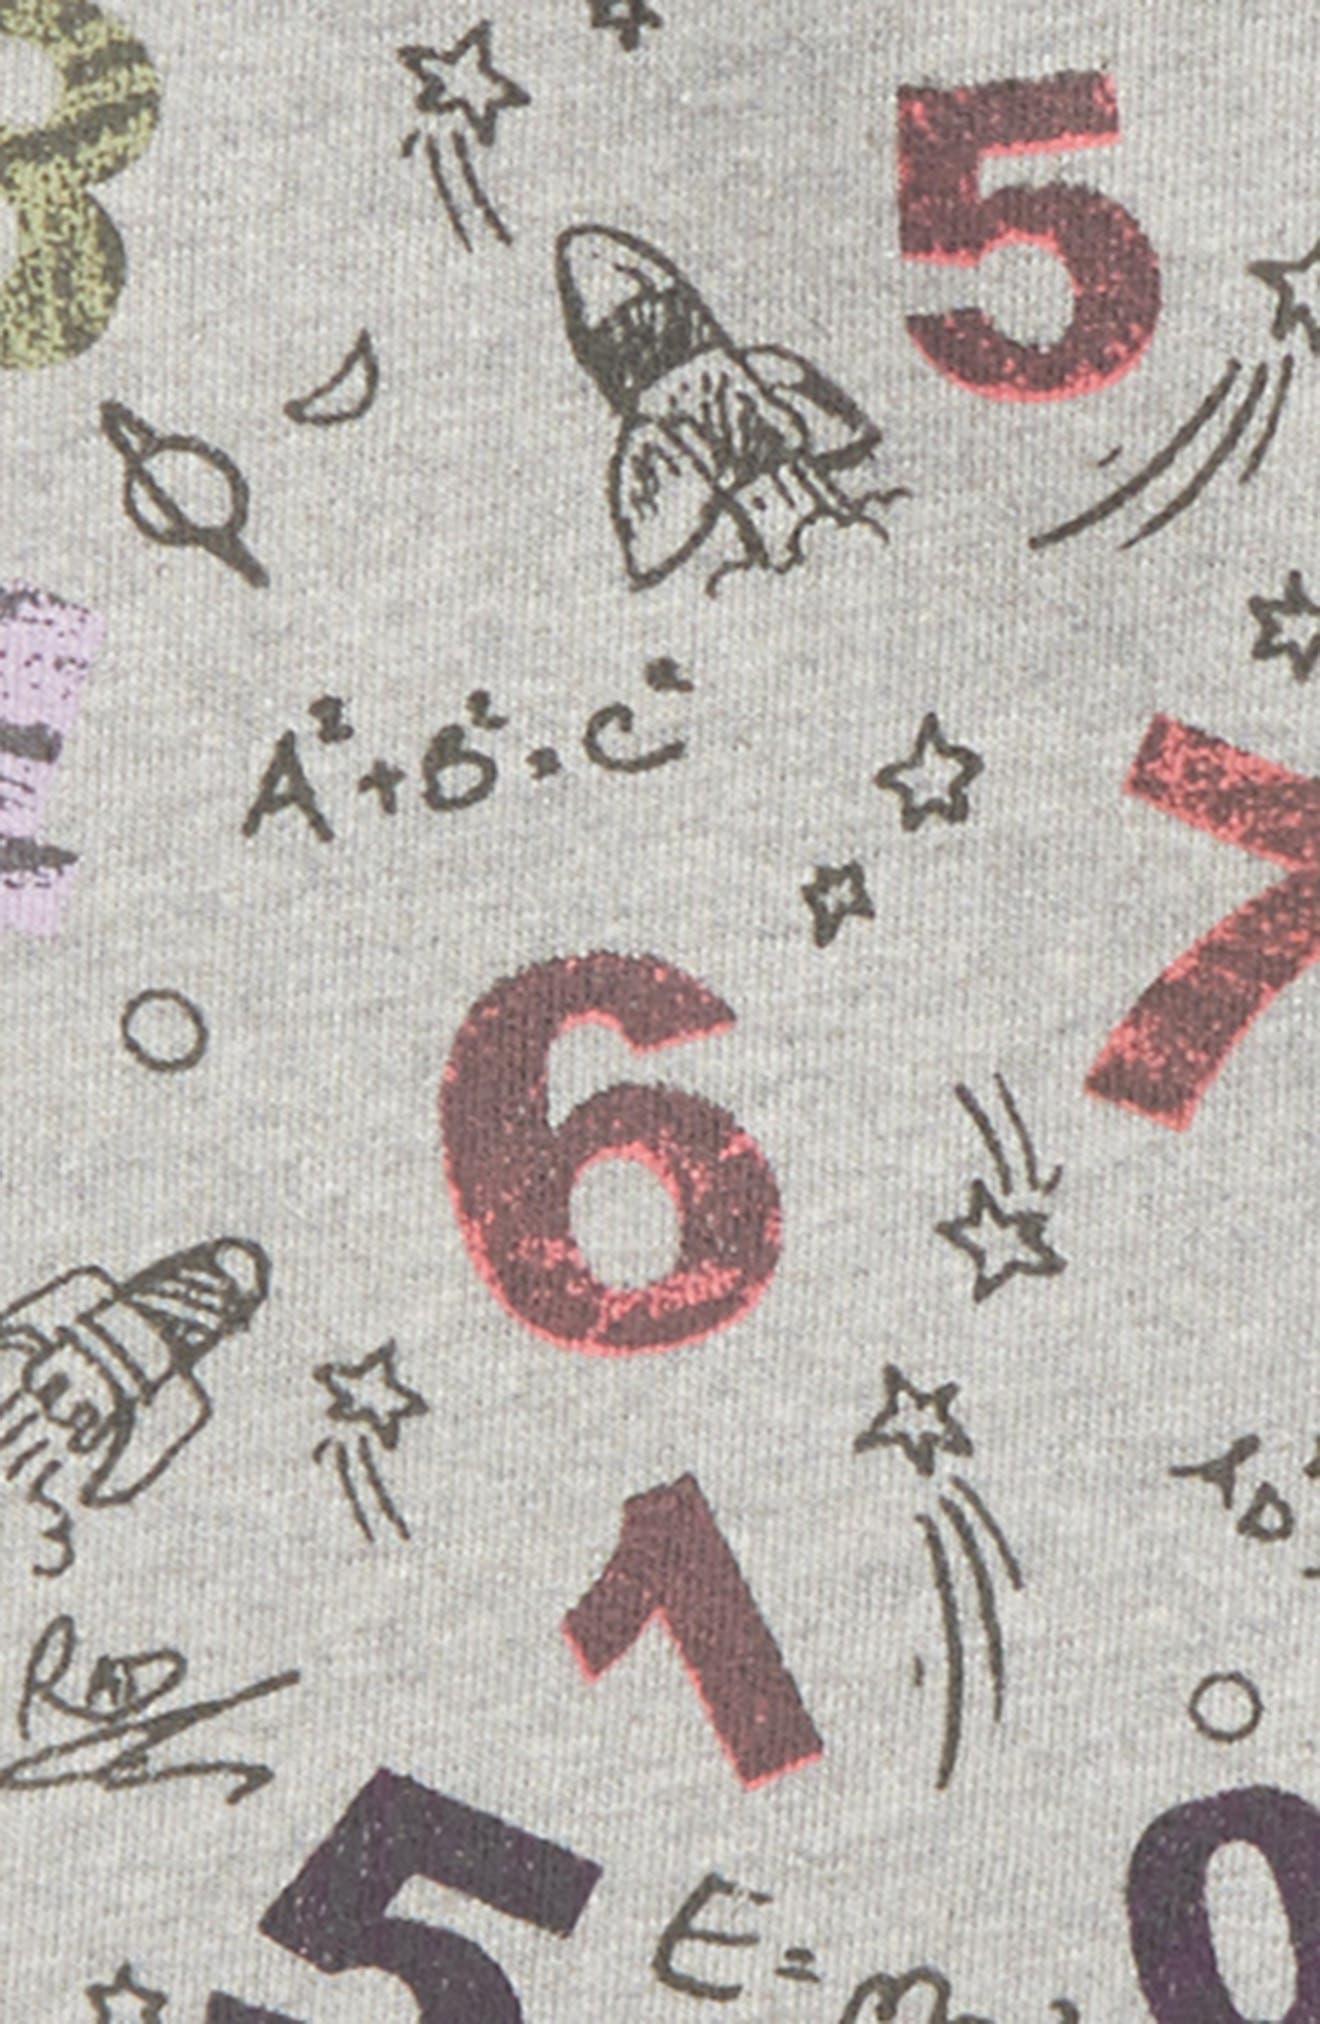 Numbers Graphic Sweatshirt,                             Alternate thumbnail 2, color,                             031